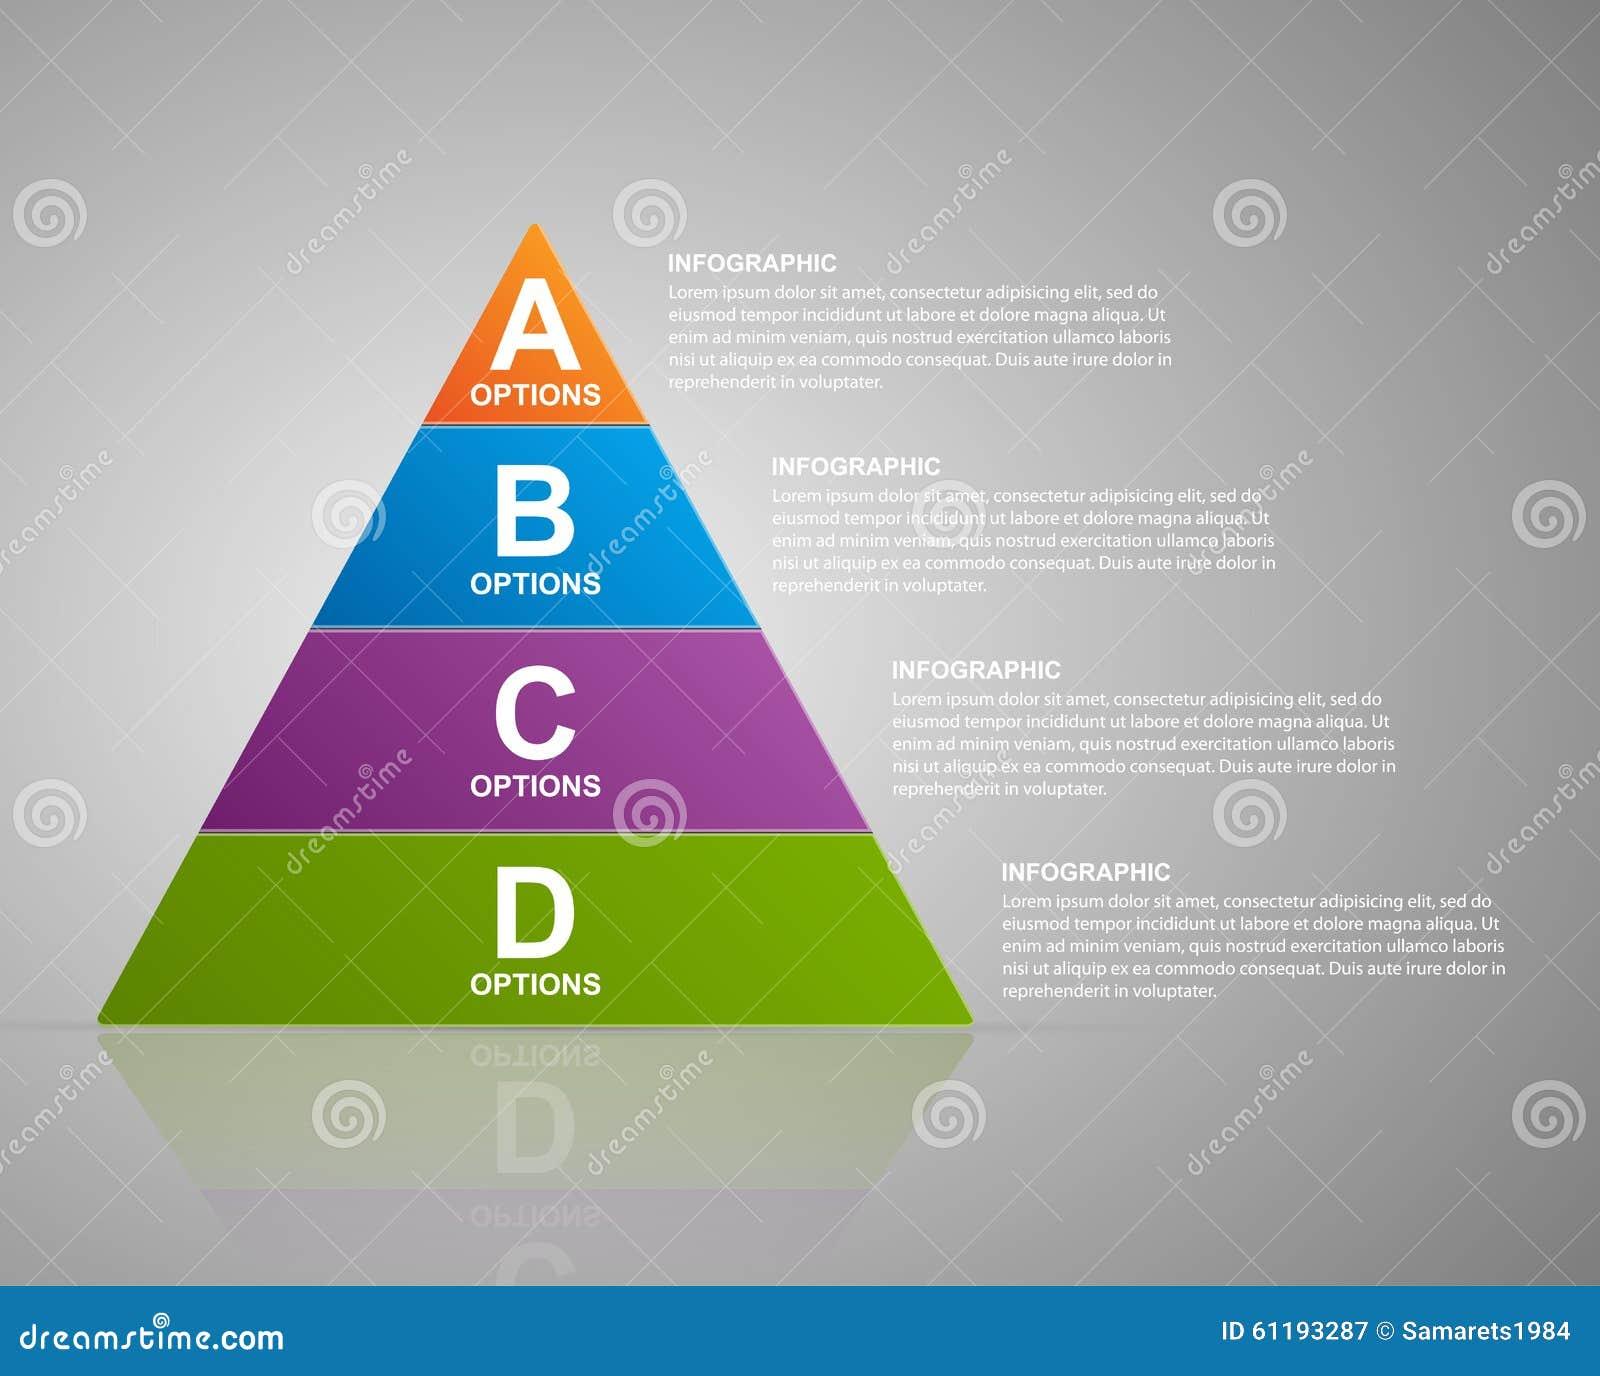 Vector Infographic Pyramid. Web Design Template. Stock Vector ...